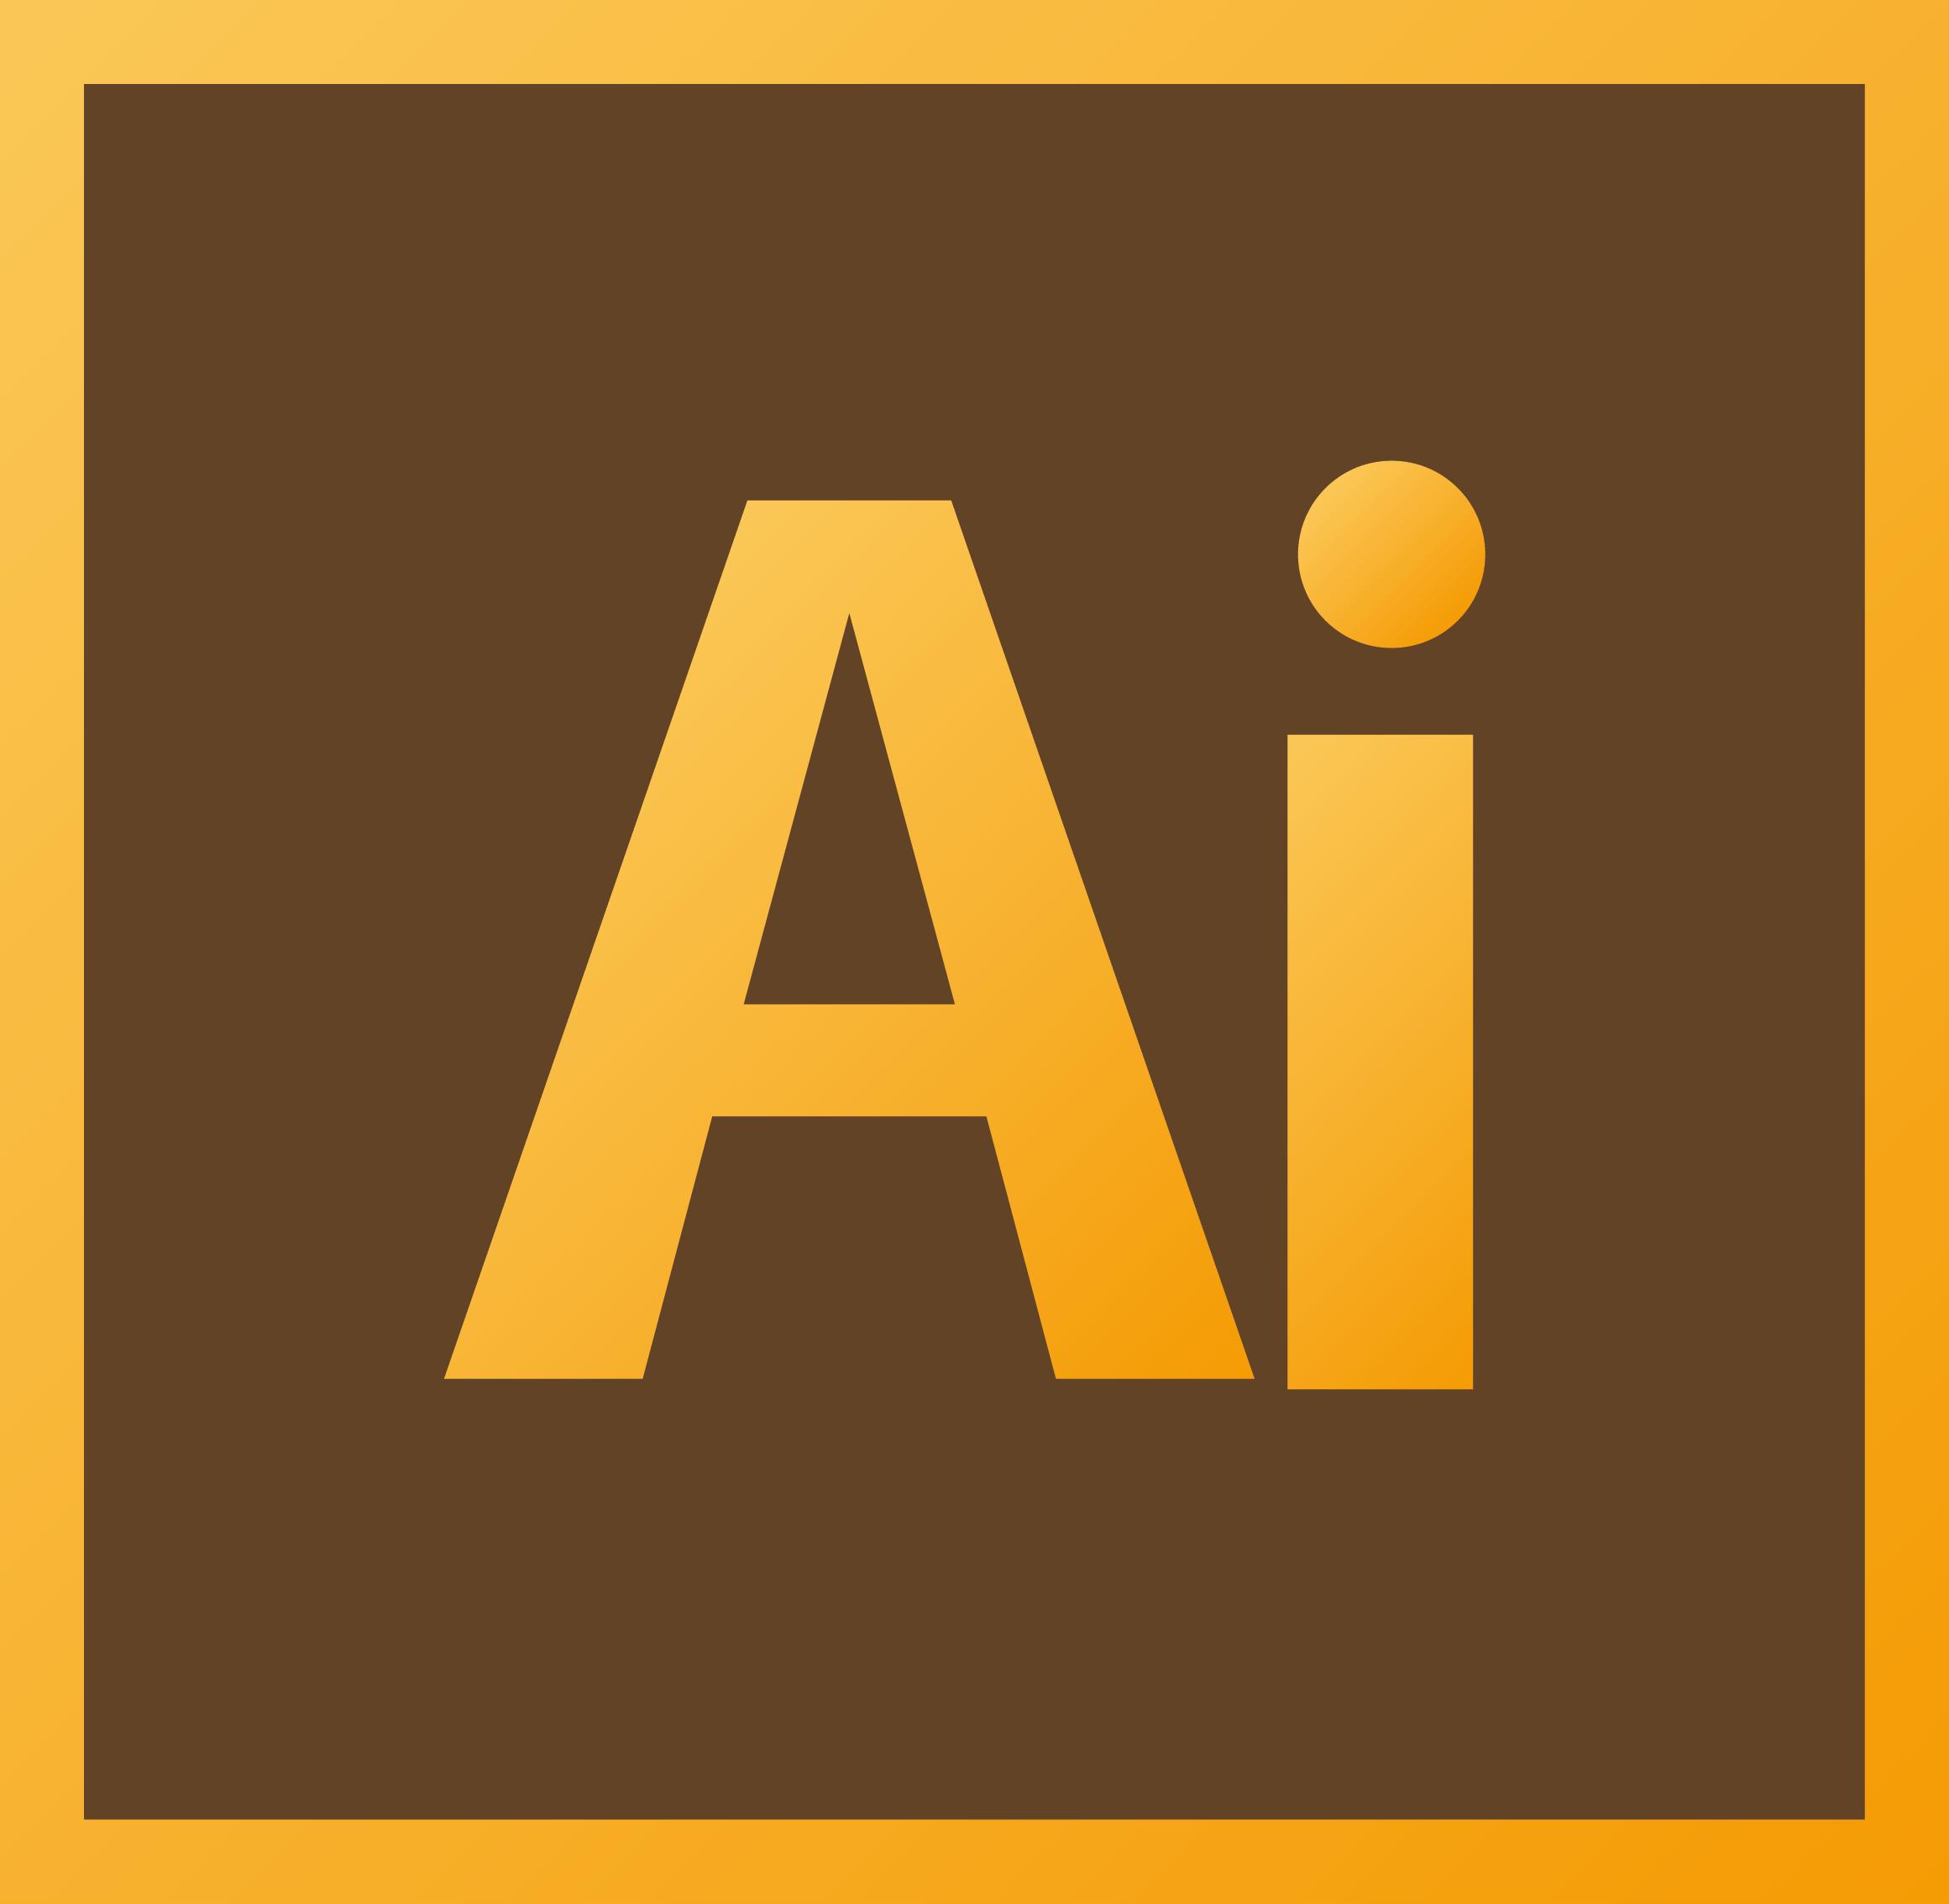 Ai Logo Adobe Illustrator Vector Eps Free Download Logo